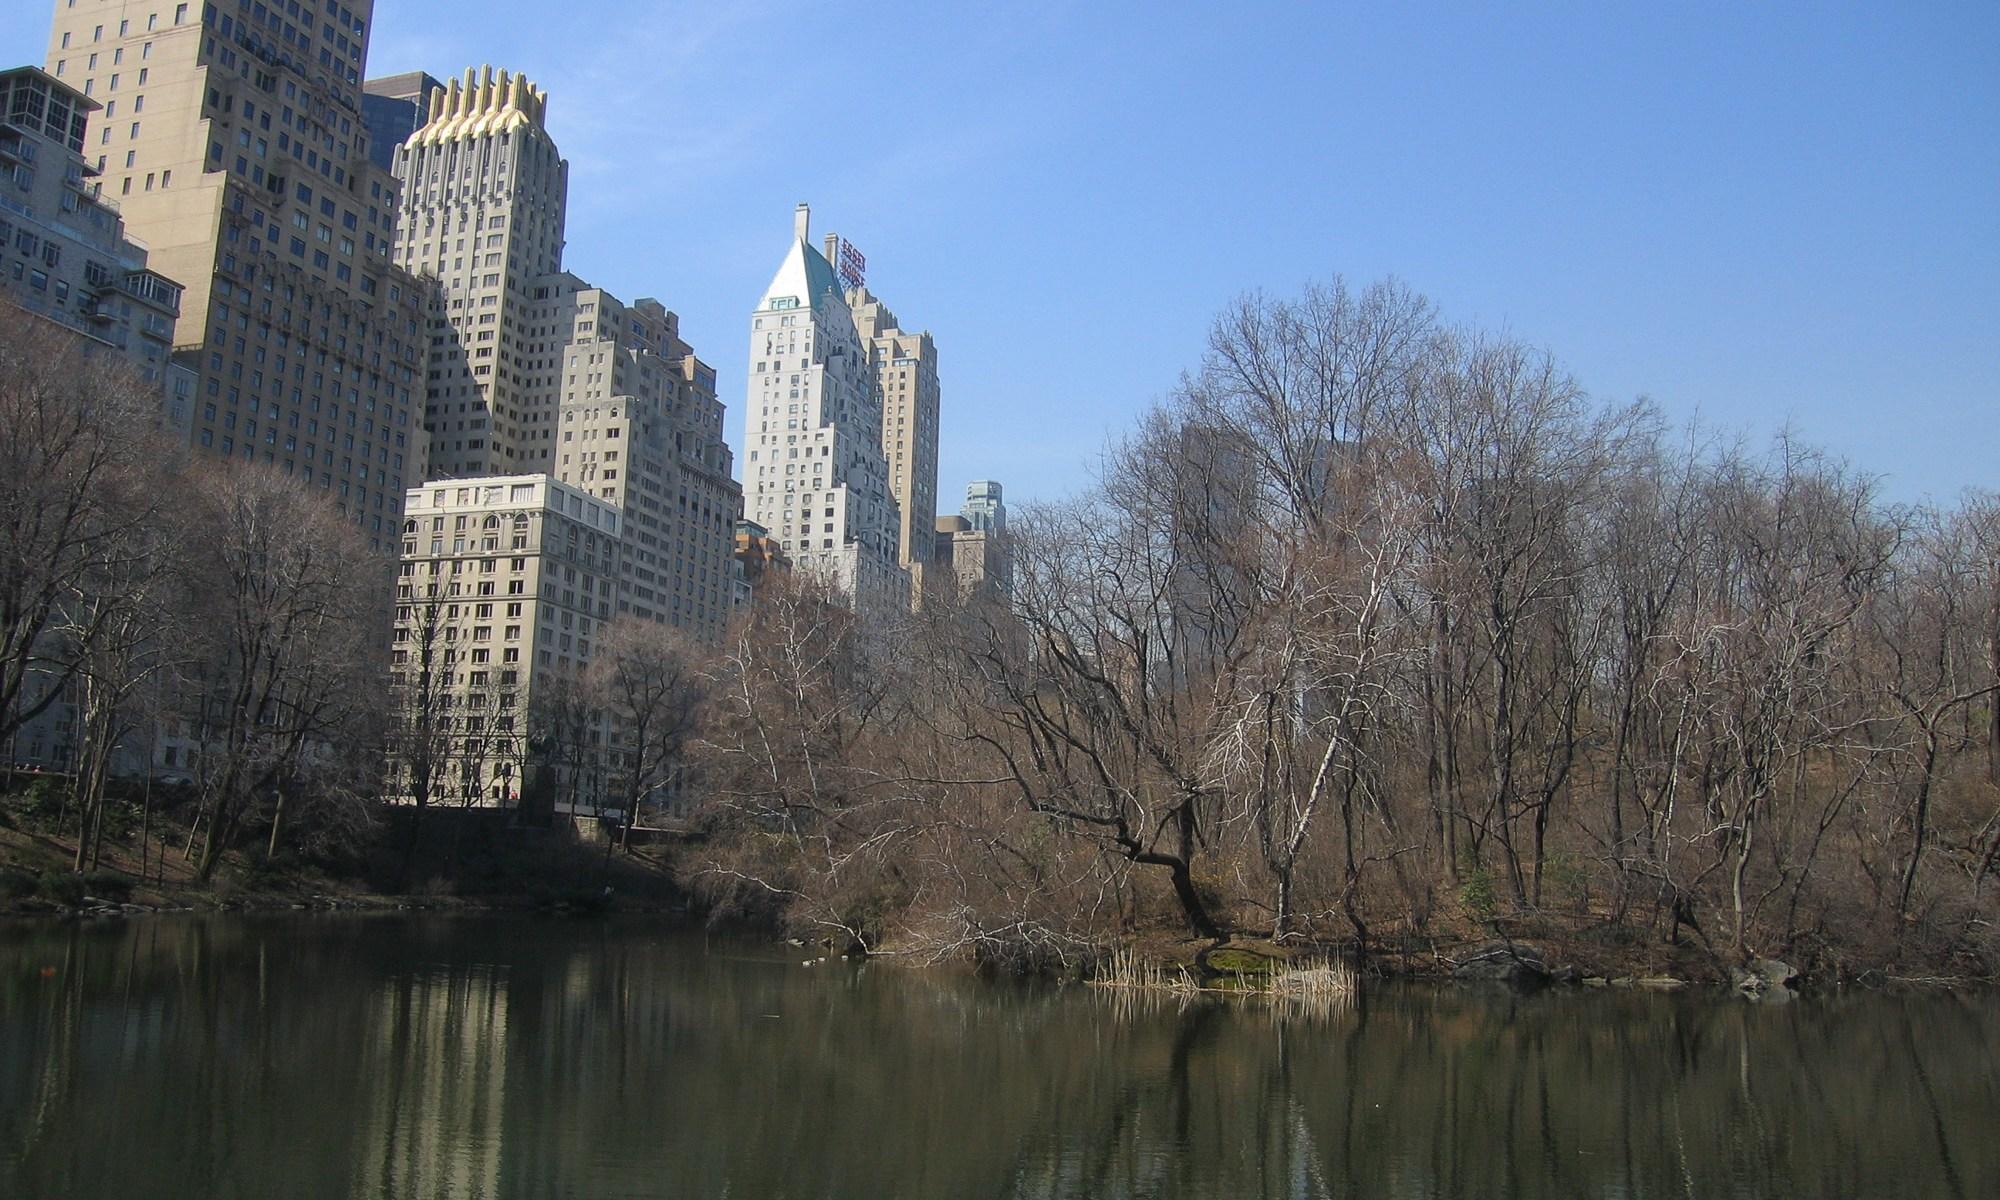 Central Park Pond - New York City